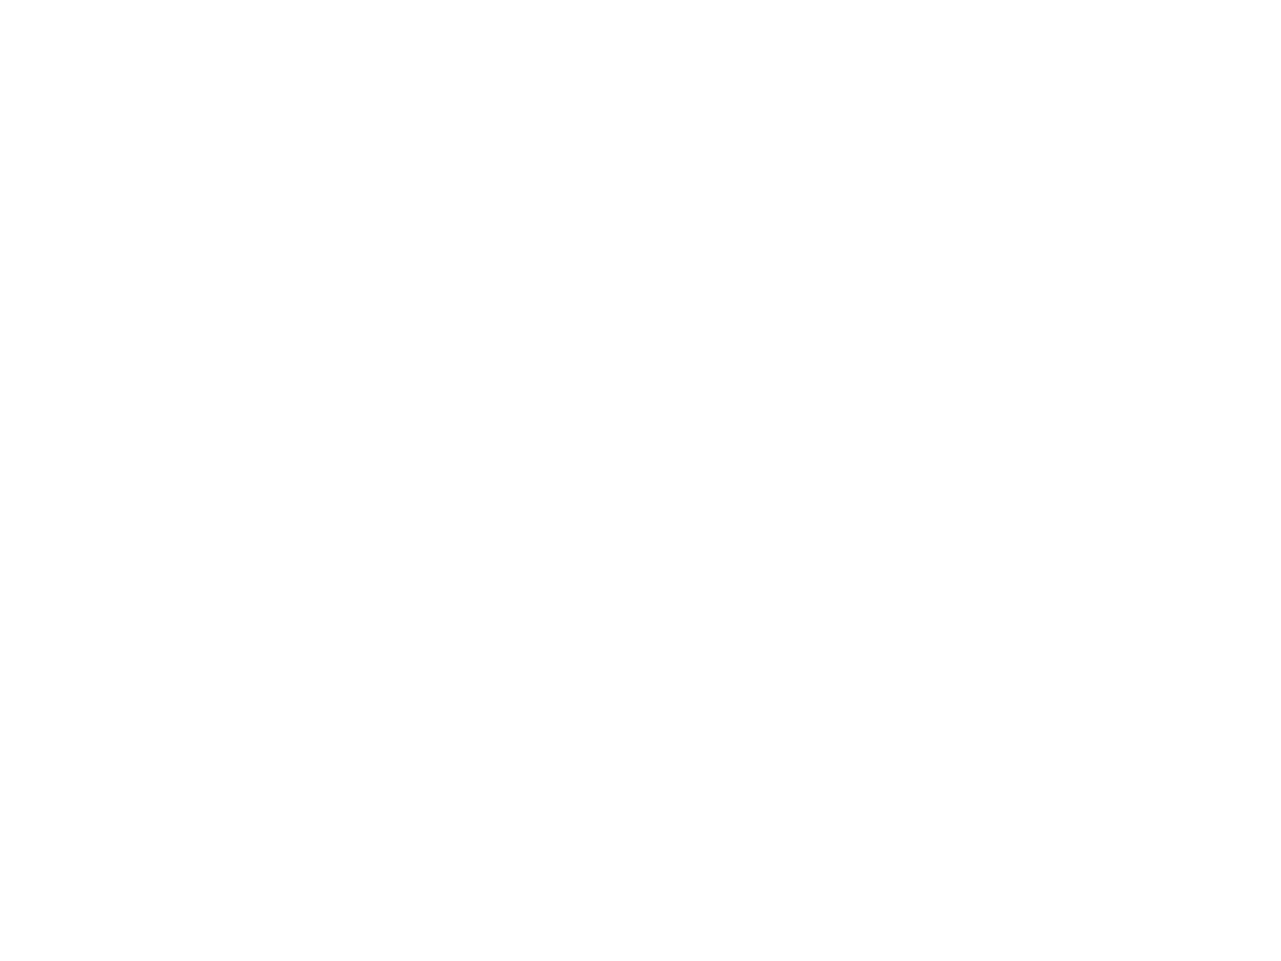 Lago di Hoan Kiem e Isola di Giada, Hanoi